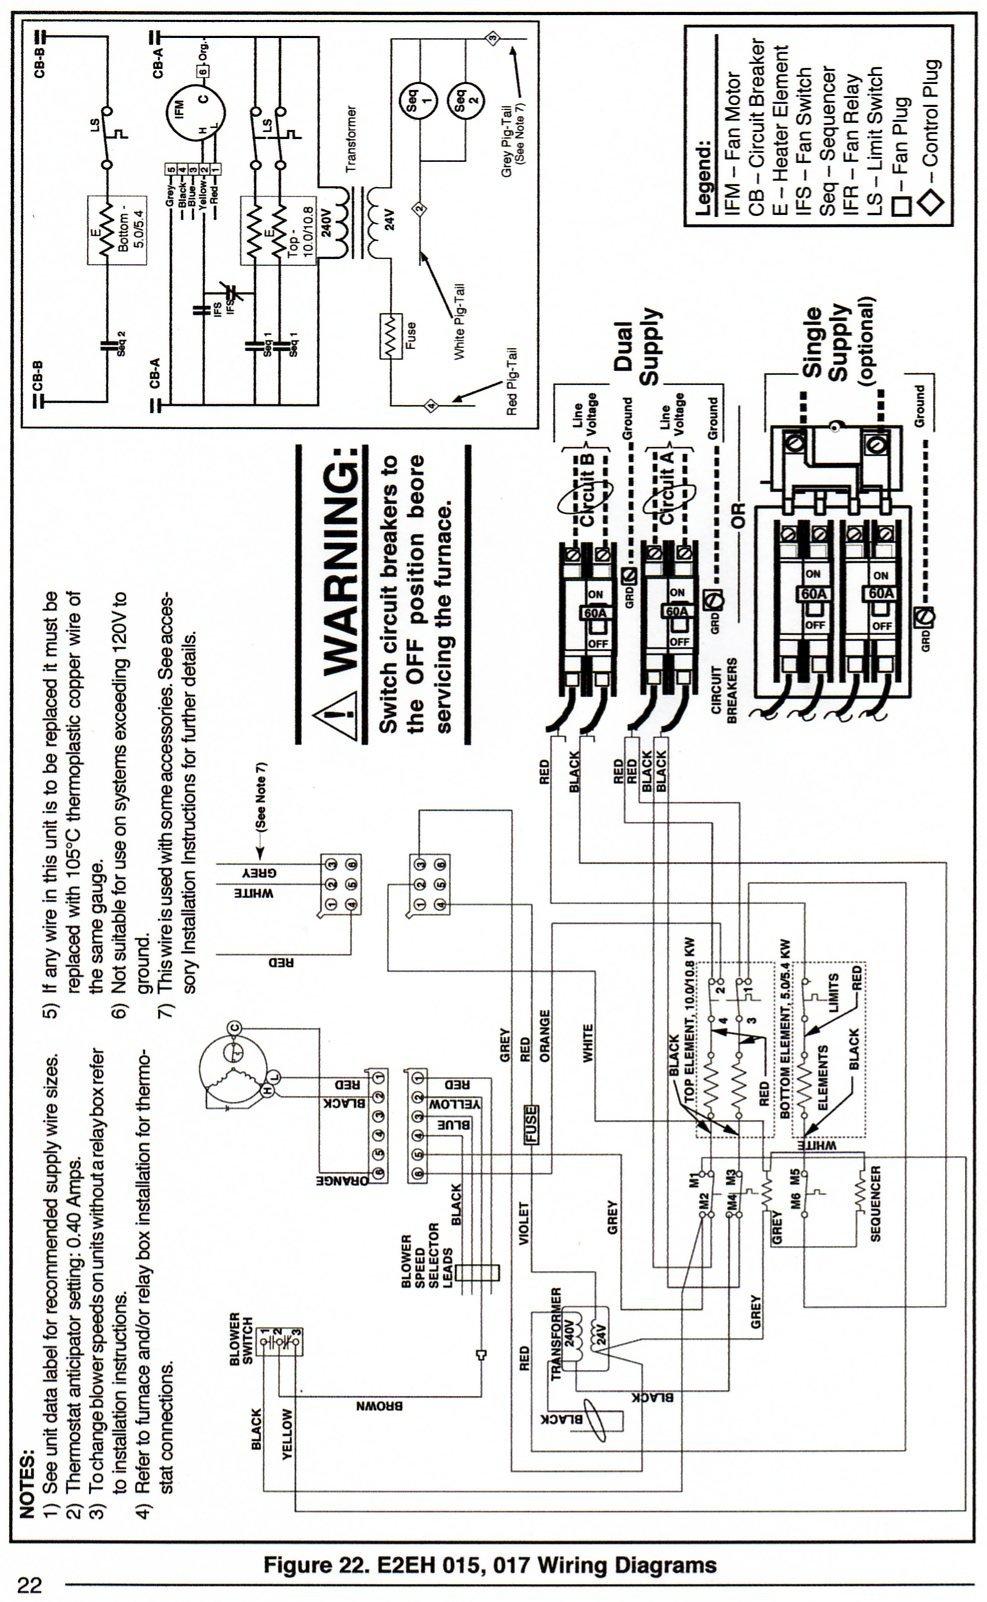 Oil Burner Control Wiring Diagram Free Download Wiring Diagram